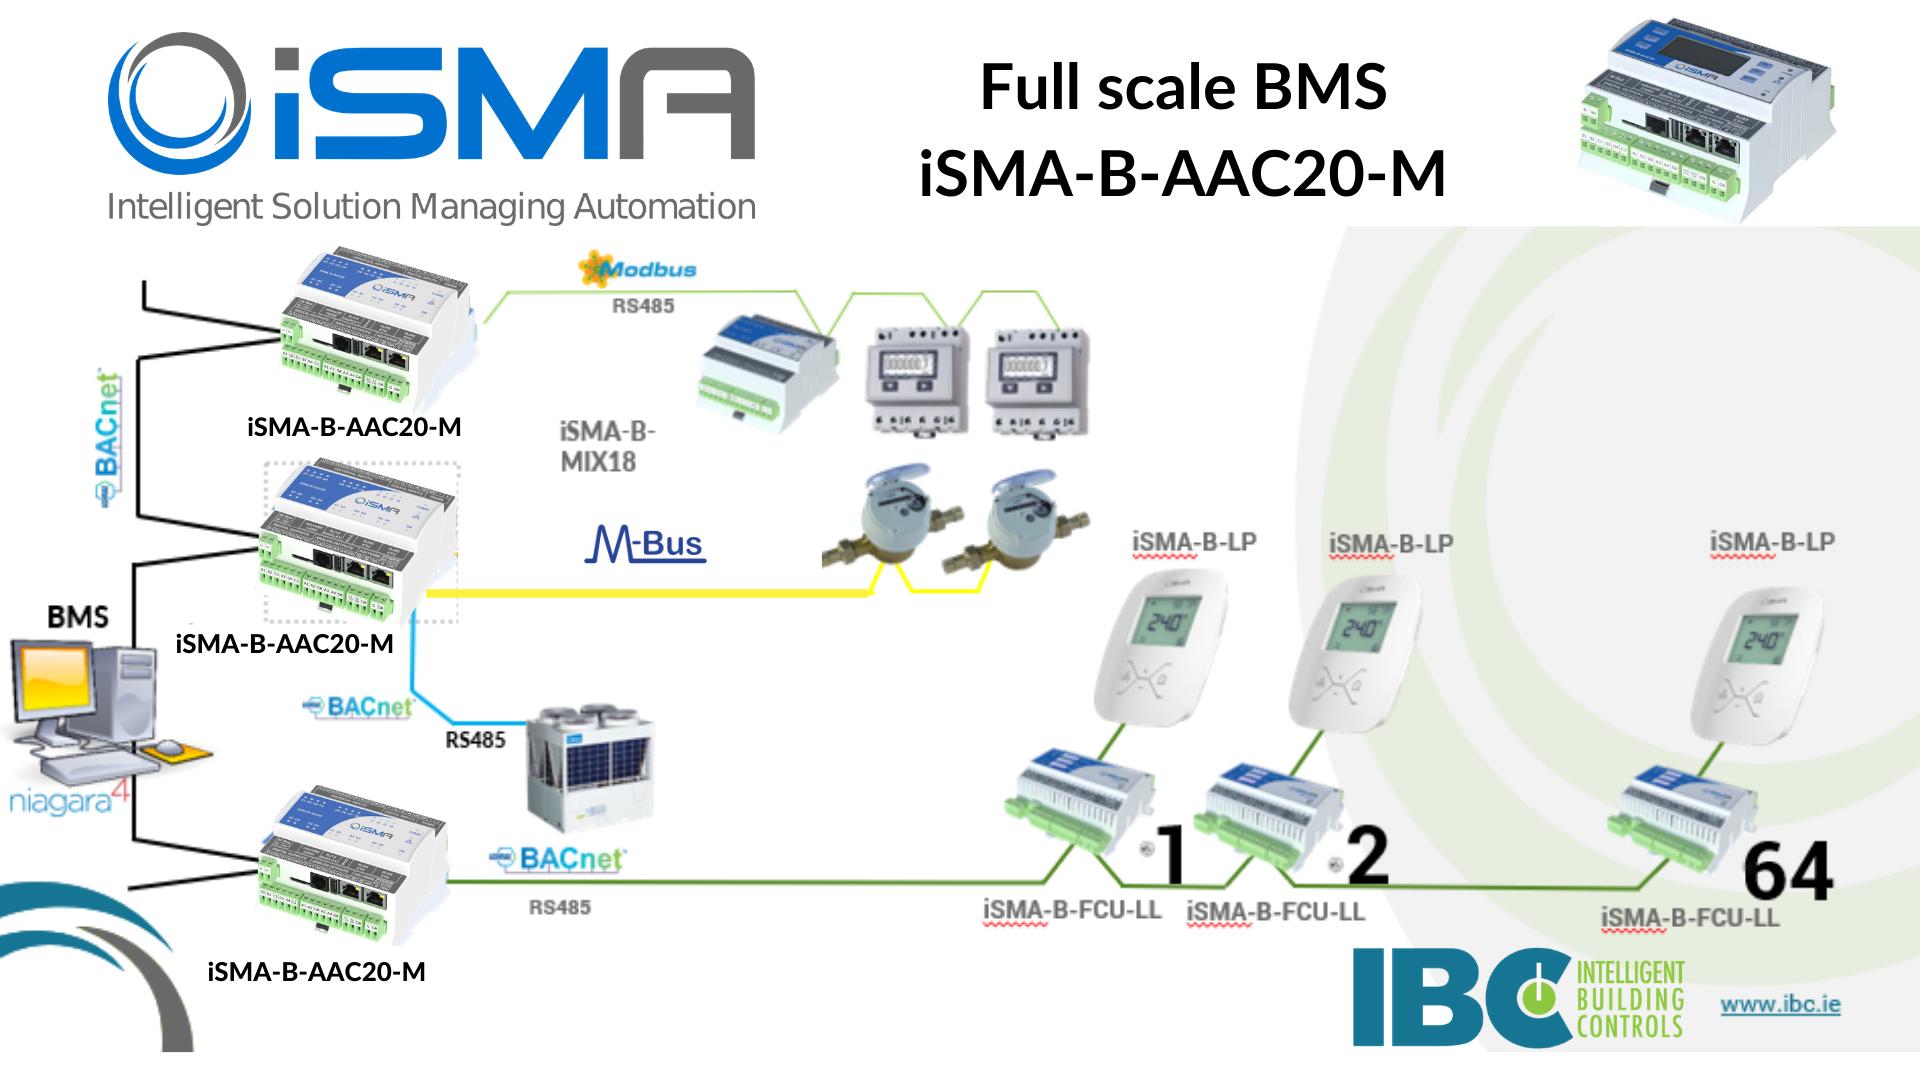 isma-b-aac20-m full scale bms